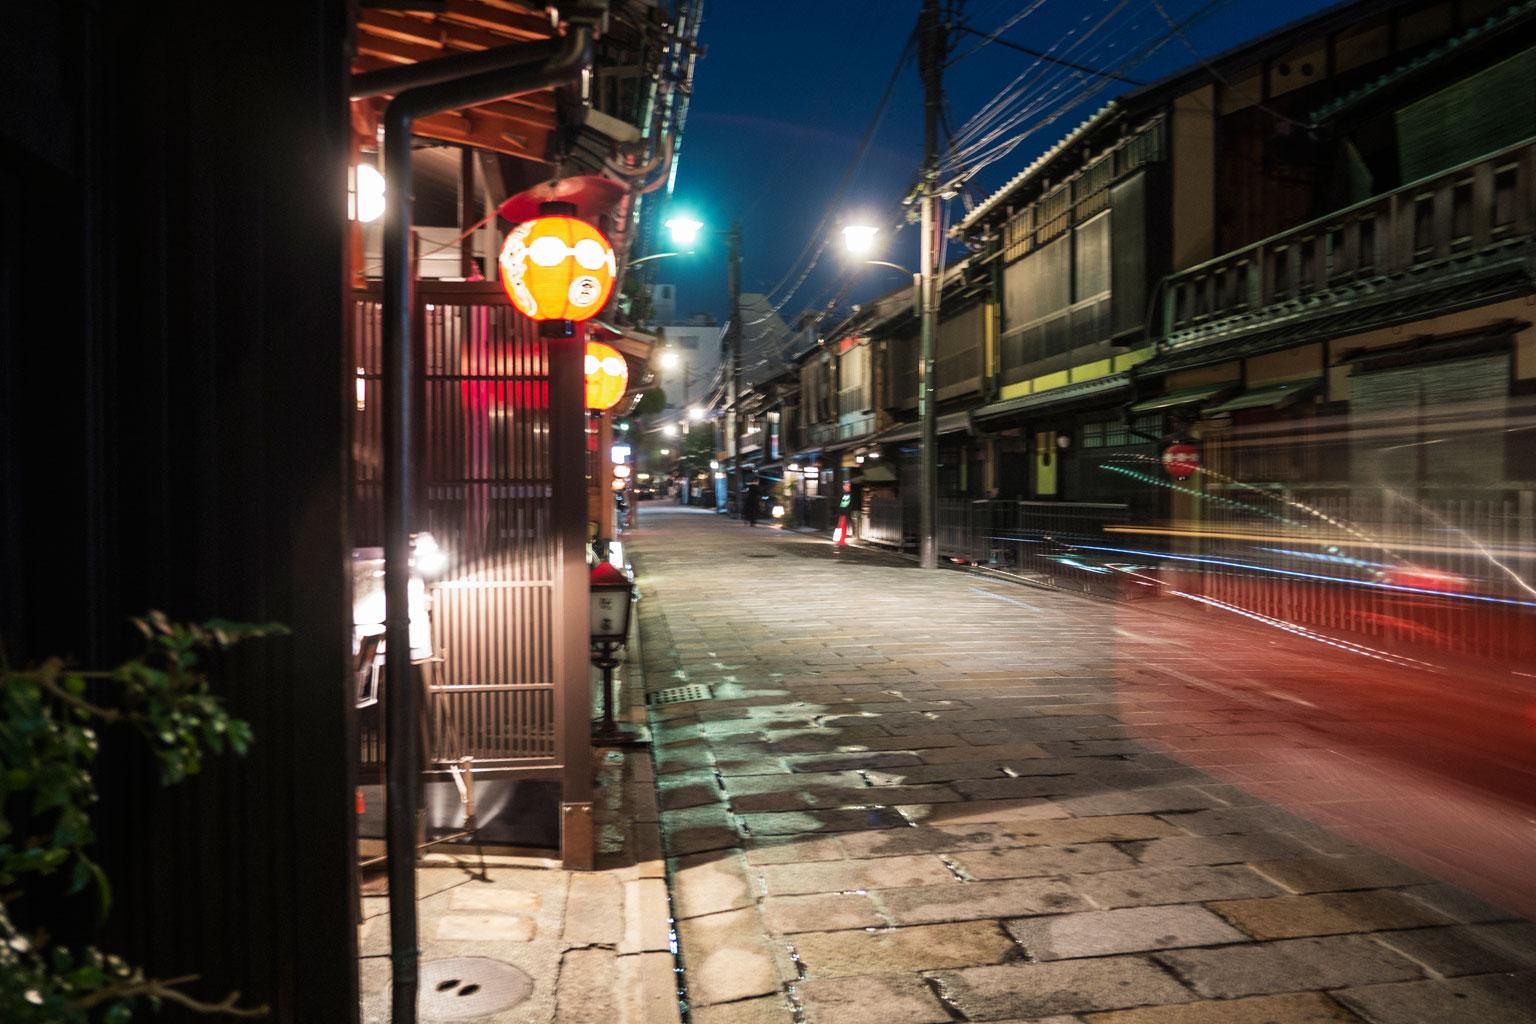 120409_PR_Japan_05_F10512.jpg